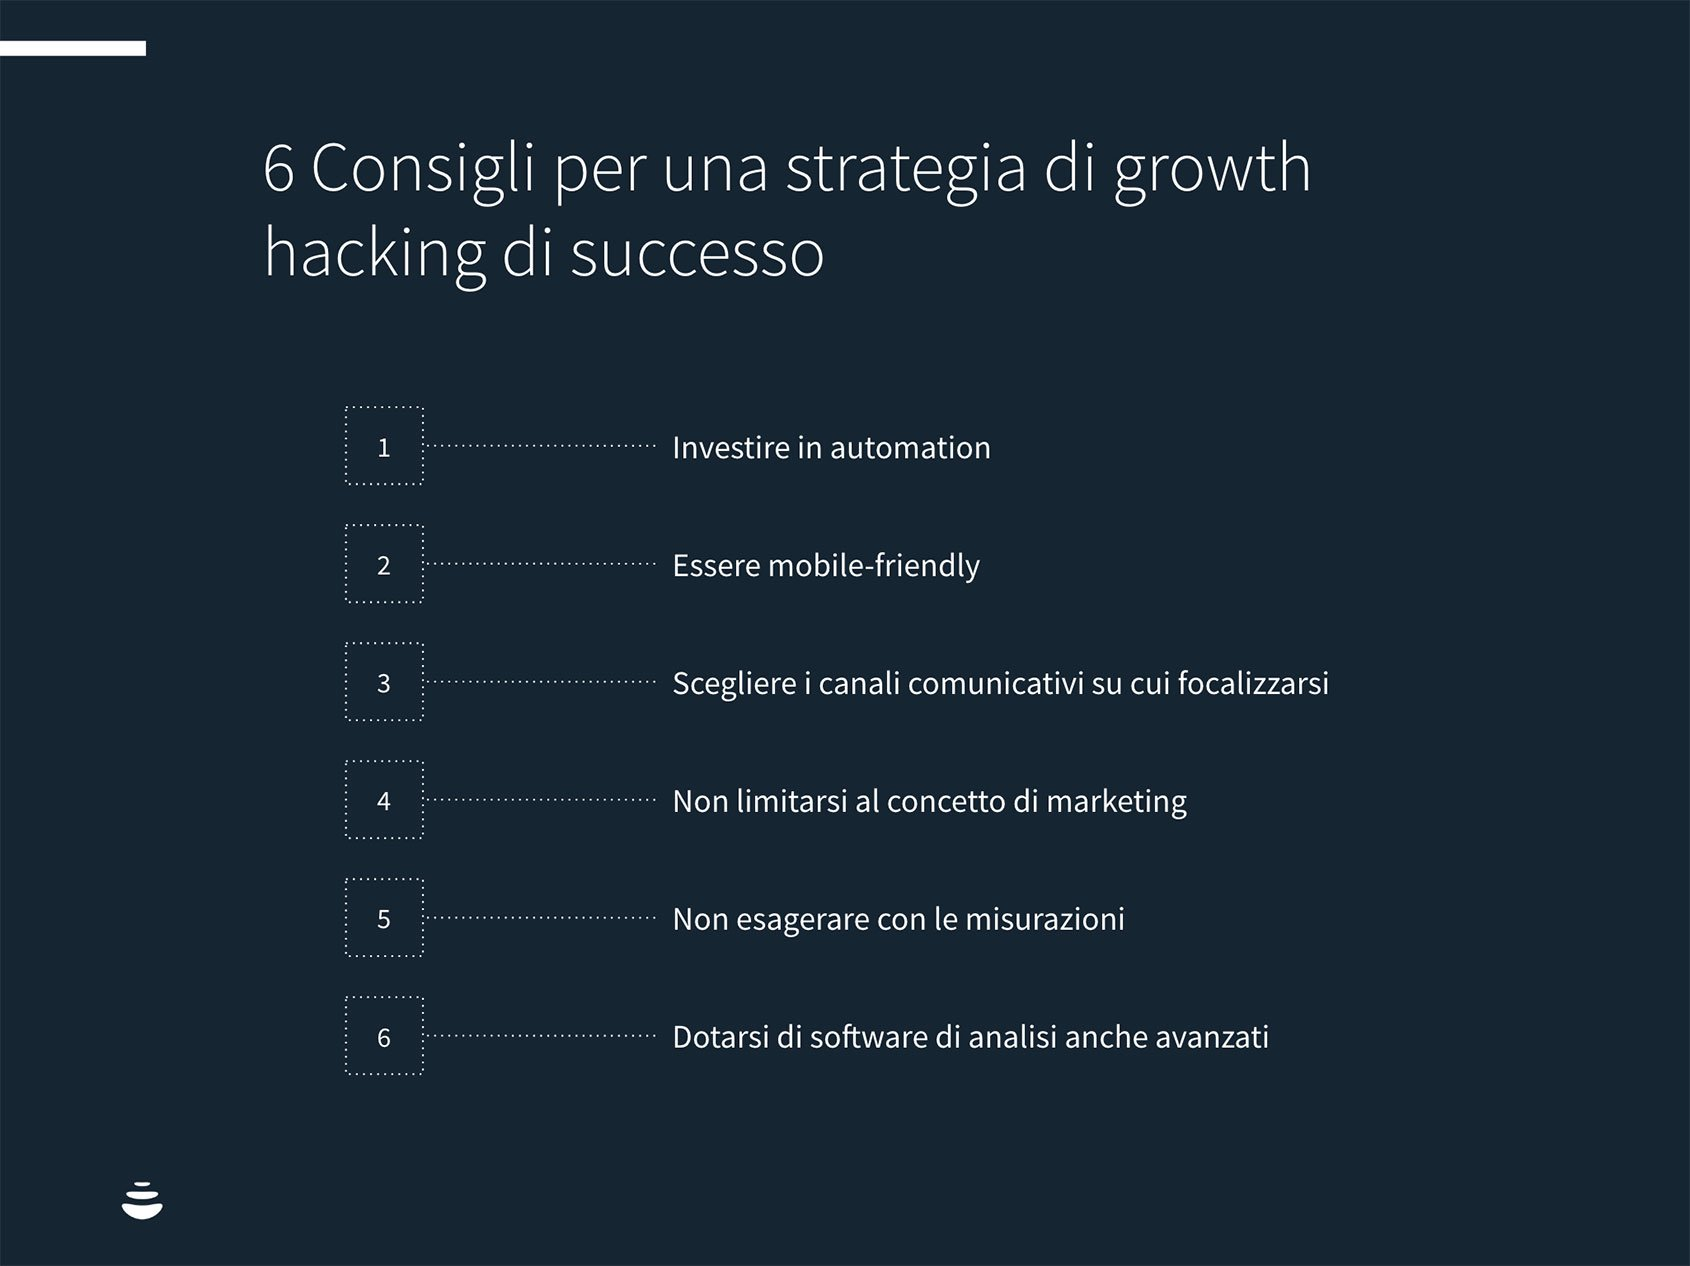 6 Consigli per una strategia di growth hacking di successo